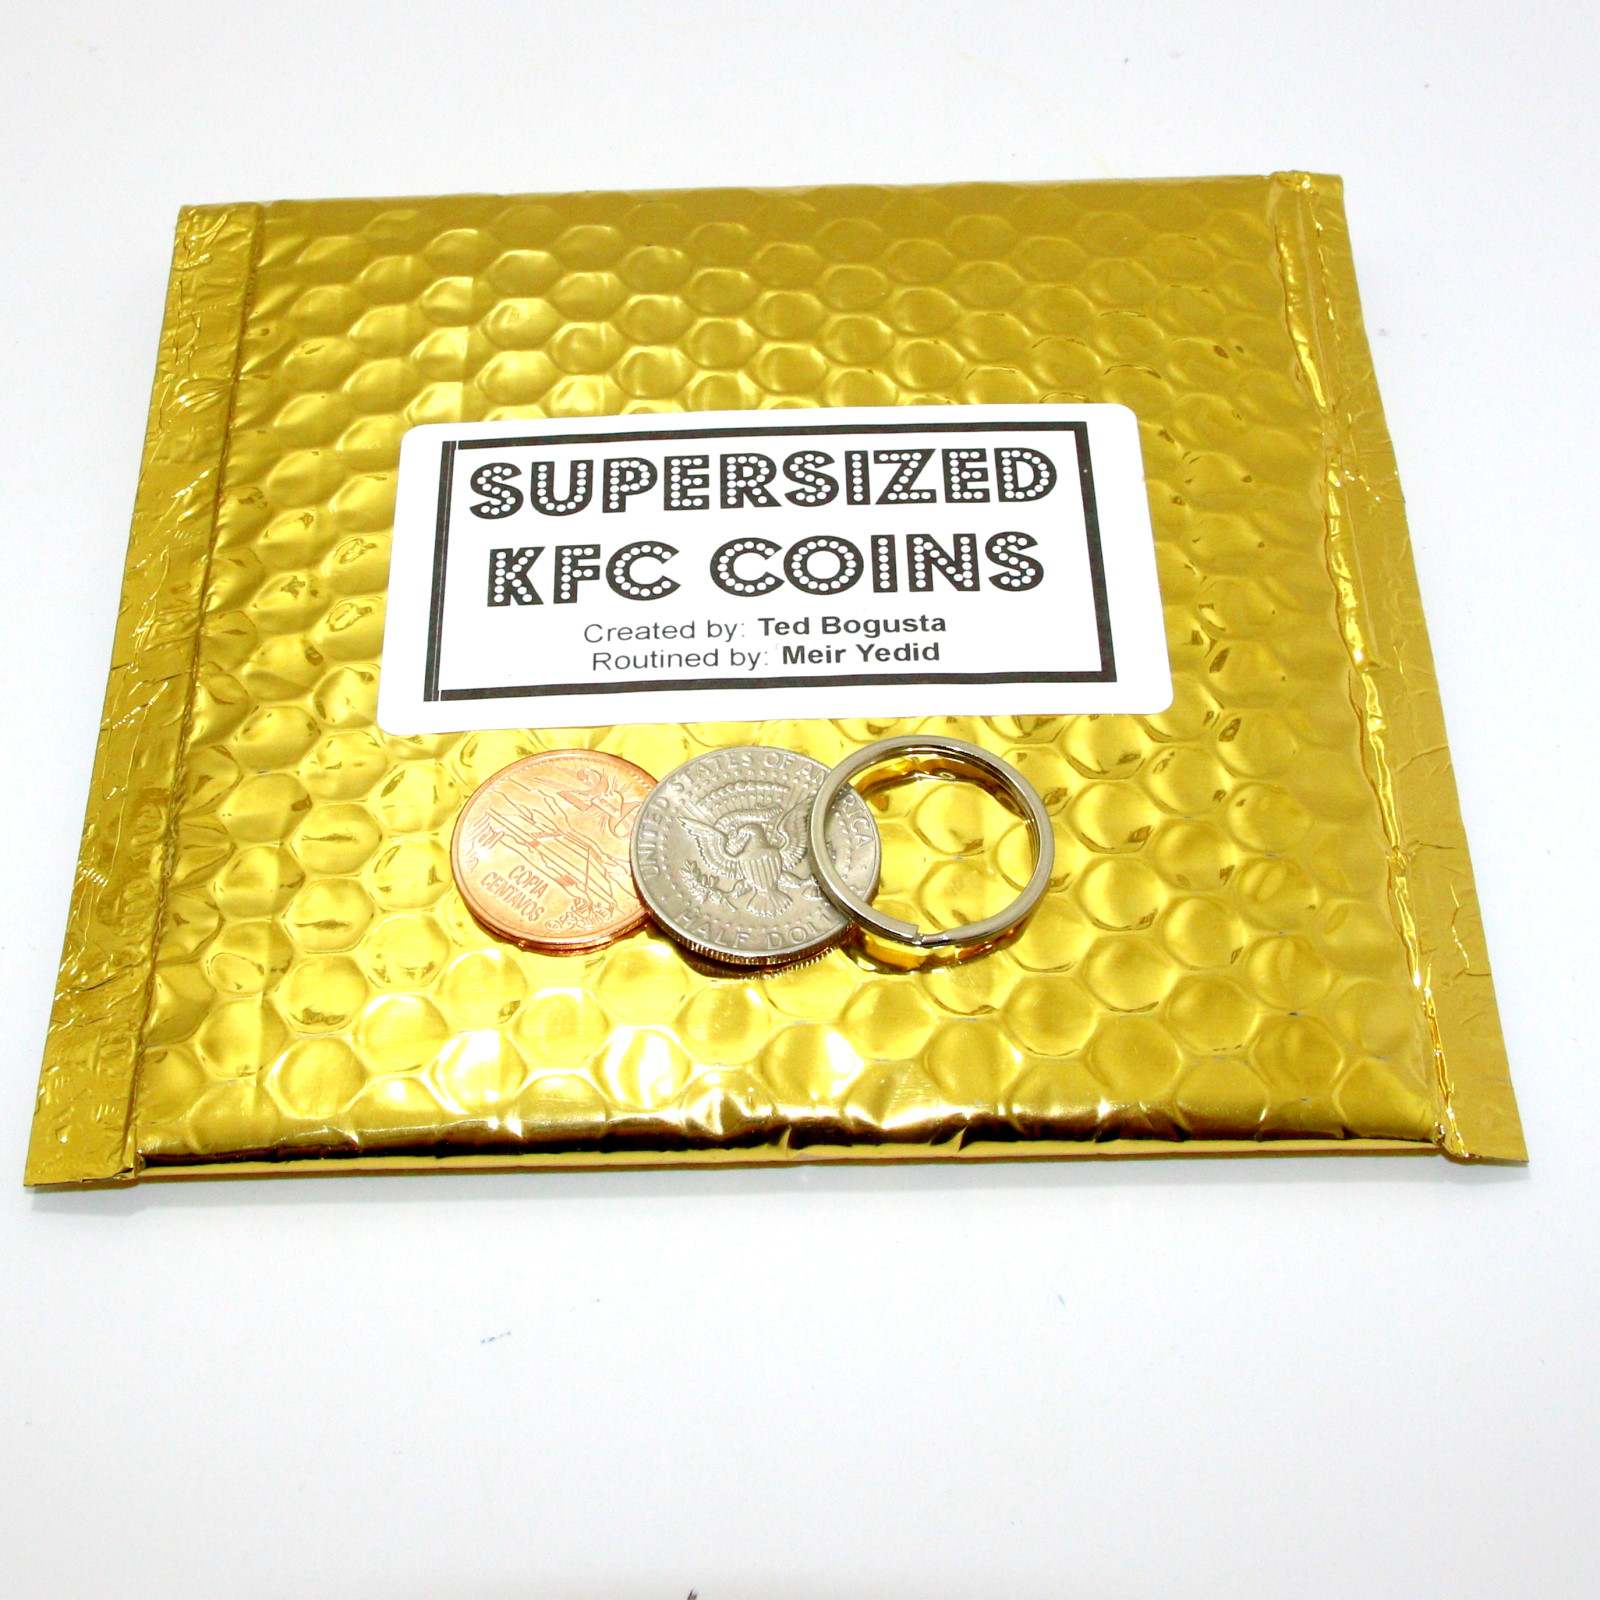 Supersized KFC Coins by Ted Bogusta, Meir Yedid